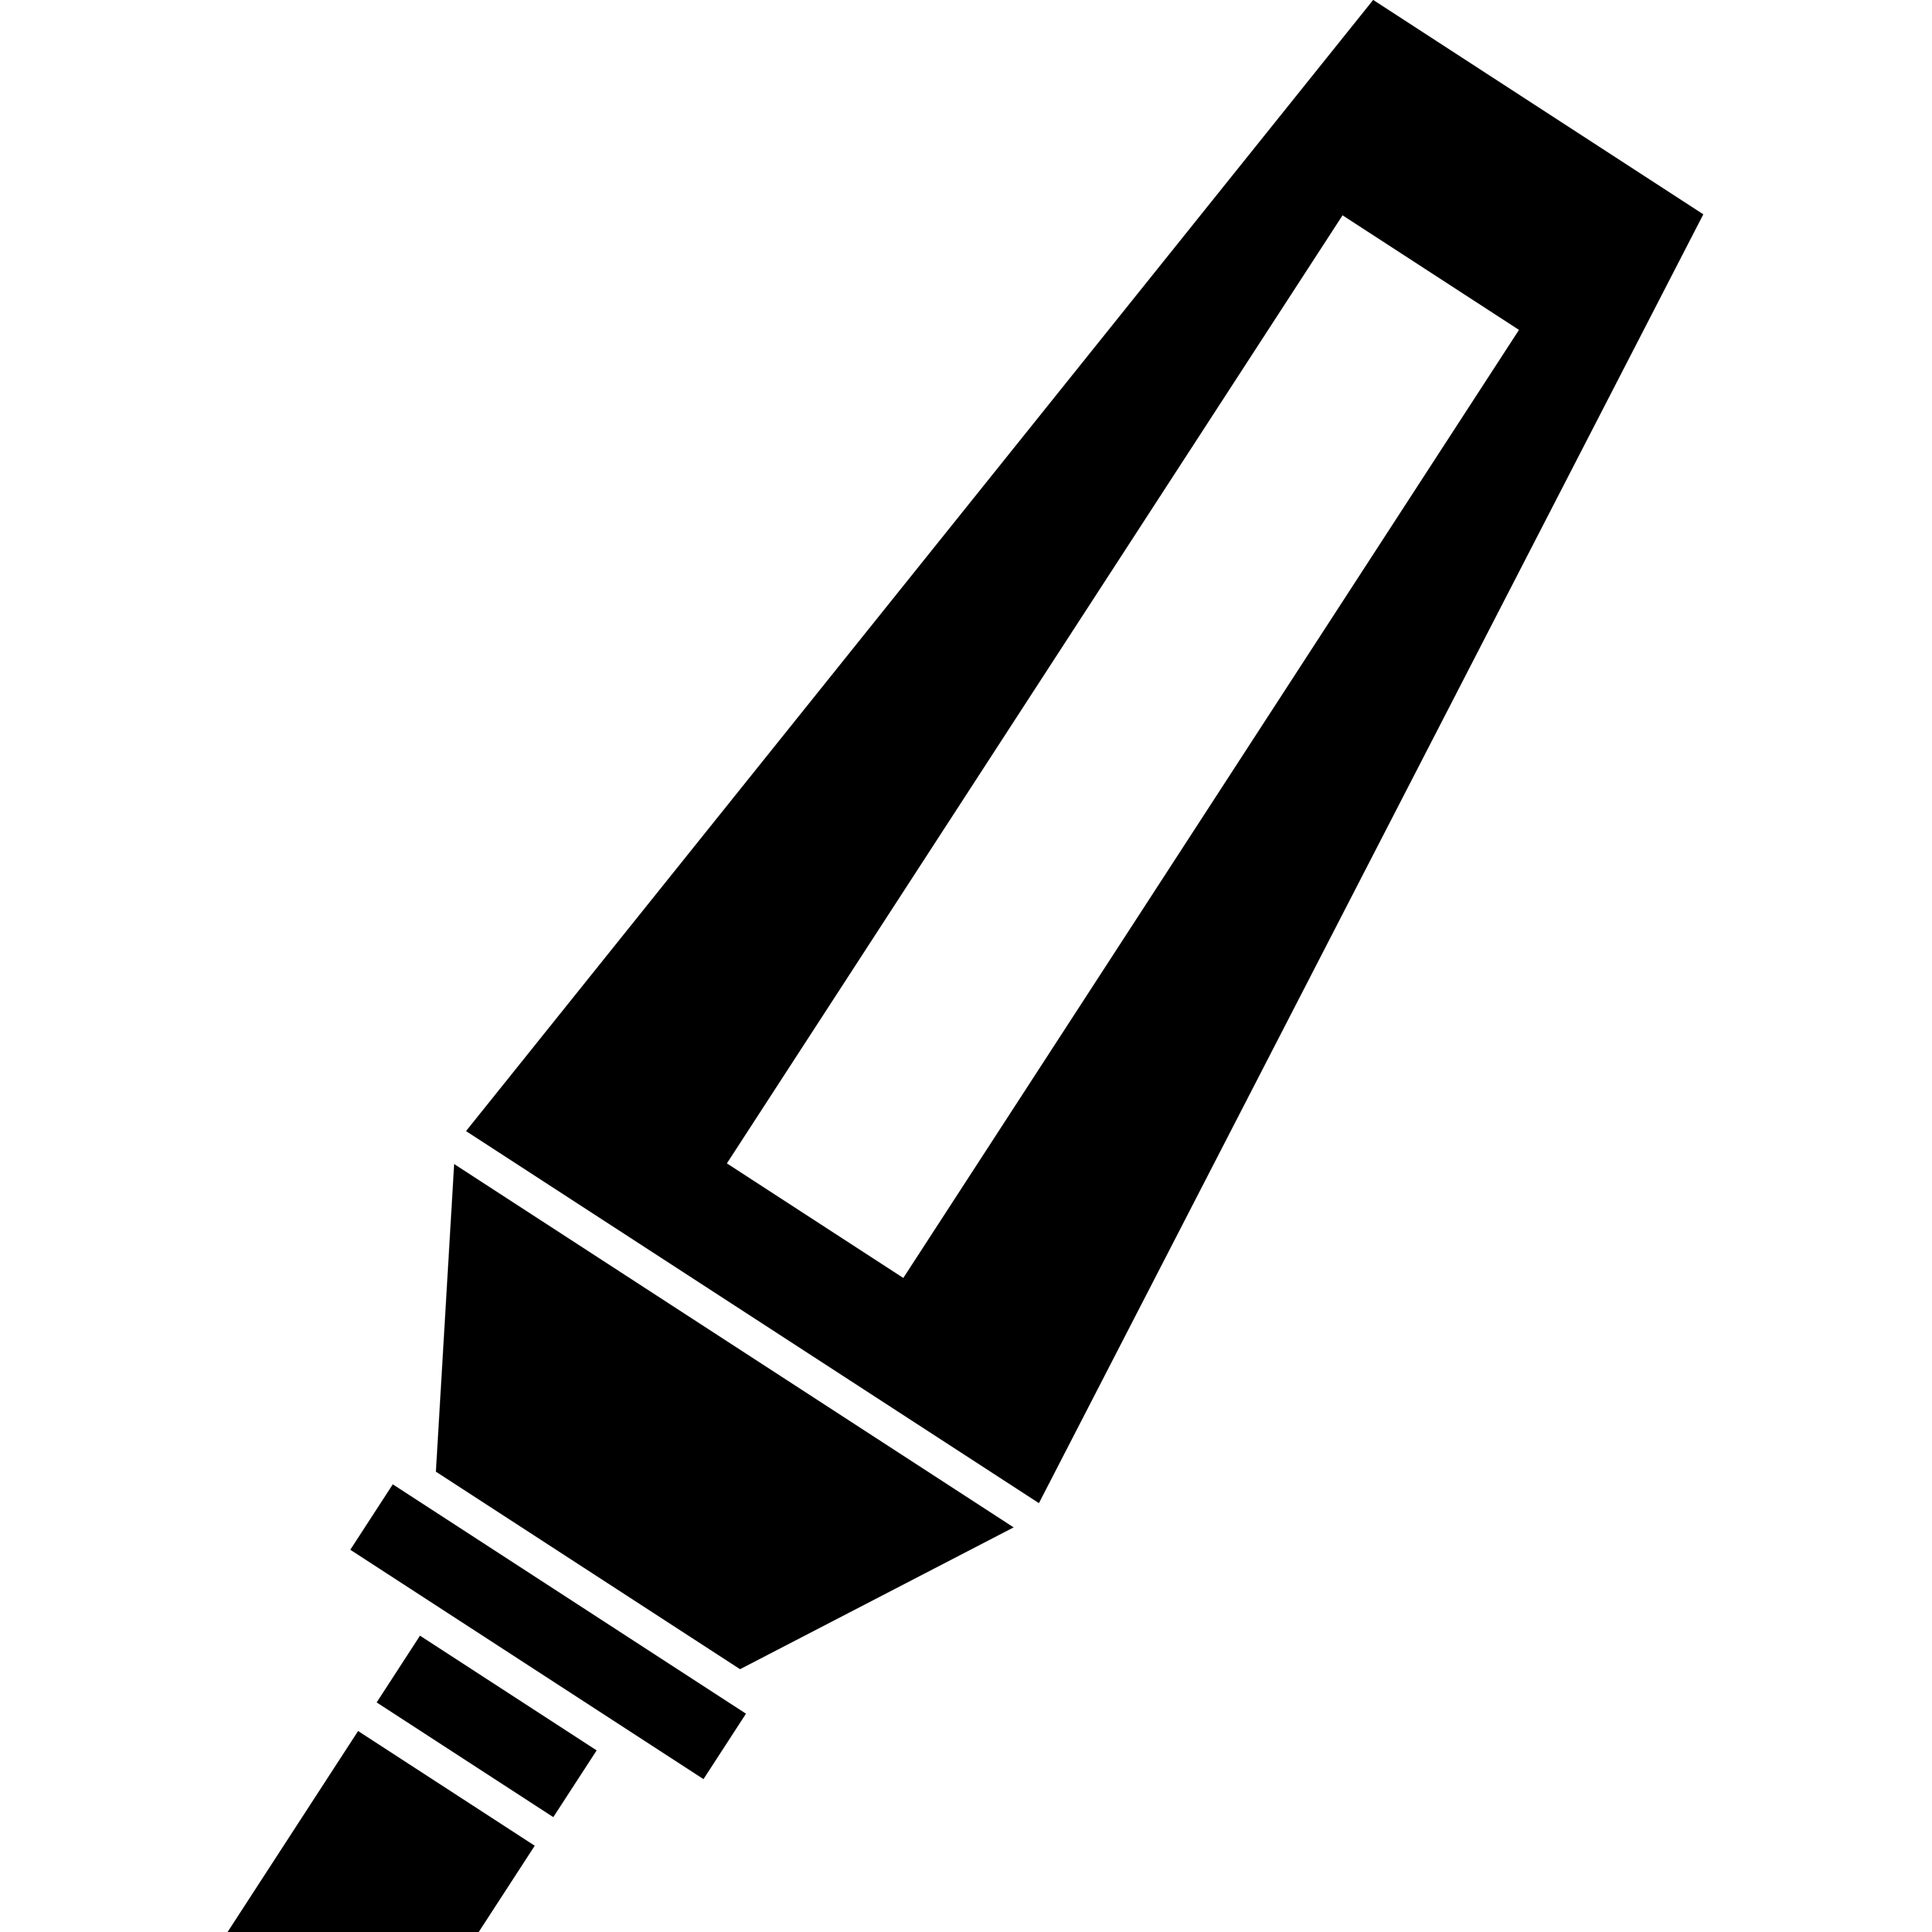 Permanent Marker Free Vector Art.